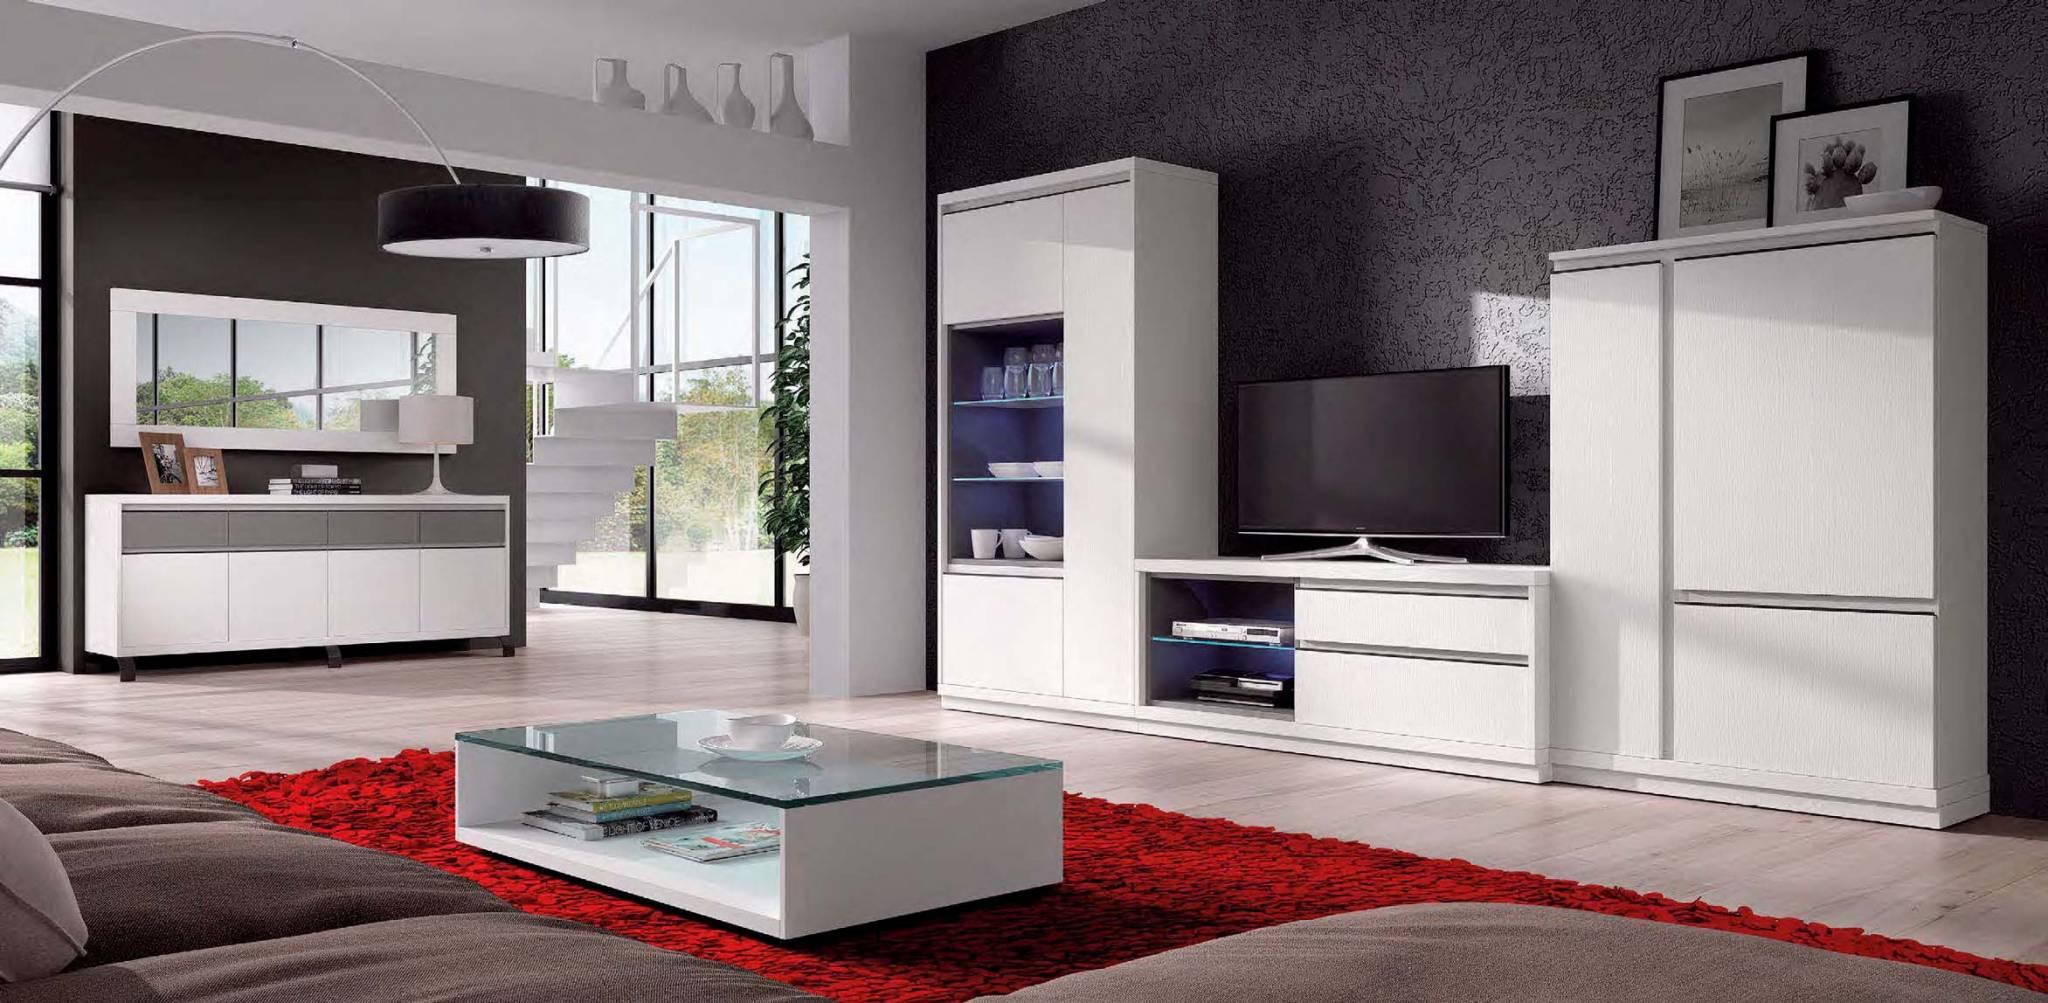 Sal n moderno villafre muebles d azmuebles d az - Muebles salon moderno ...